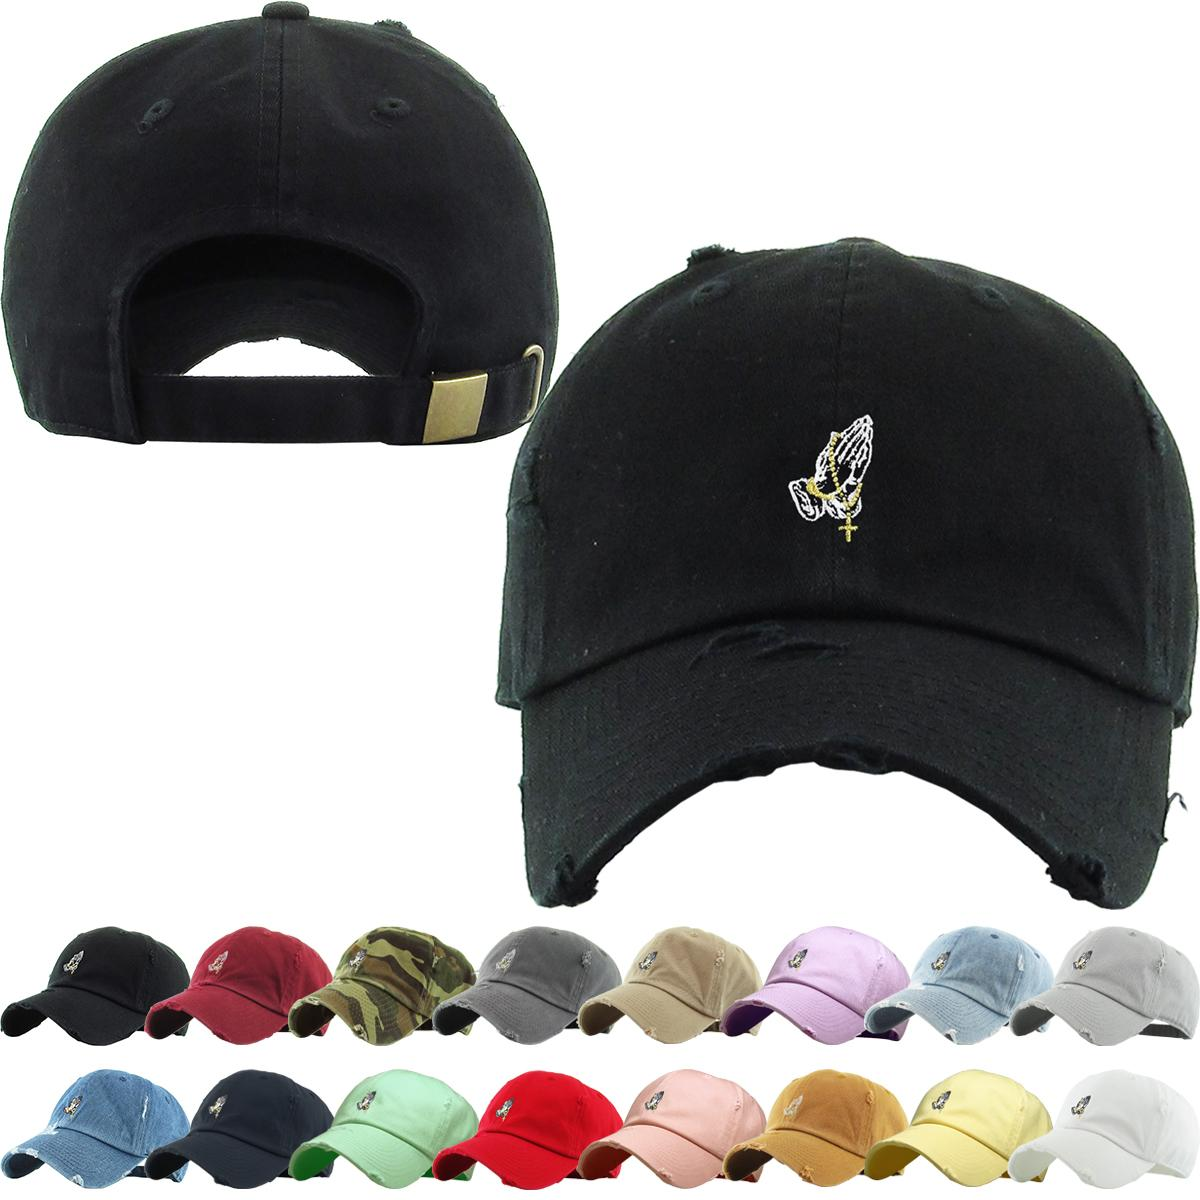 BH Cool Designs #Eavesdropper Comfortable Dad Hat Baseball Cap